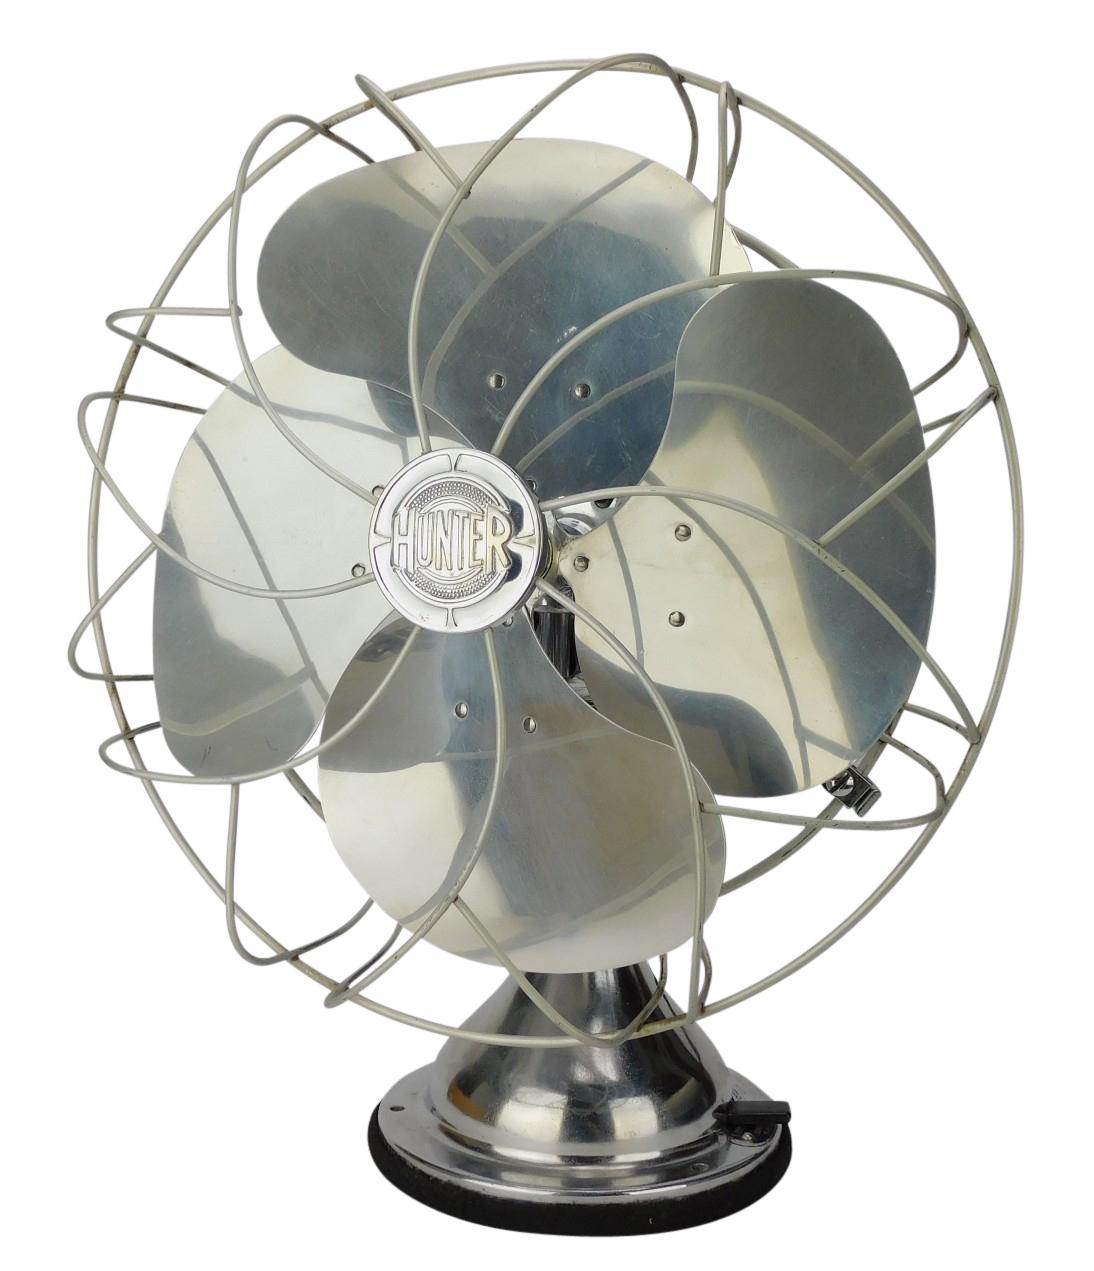 "Circa 1939 12"" Hunter All Chrome Oscillating Desk Fan"